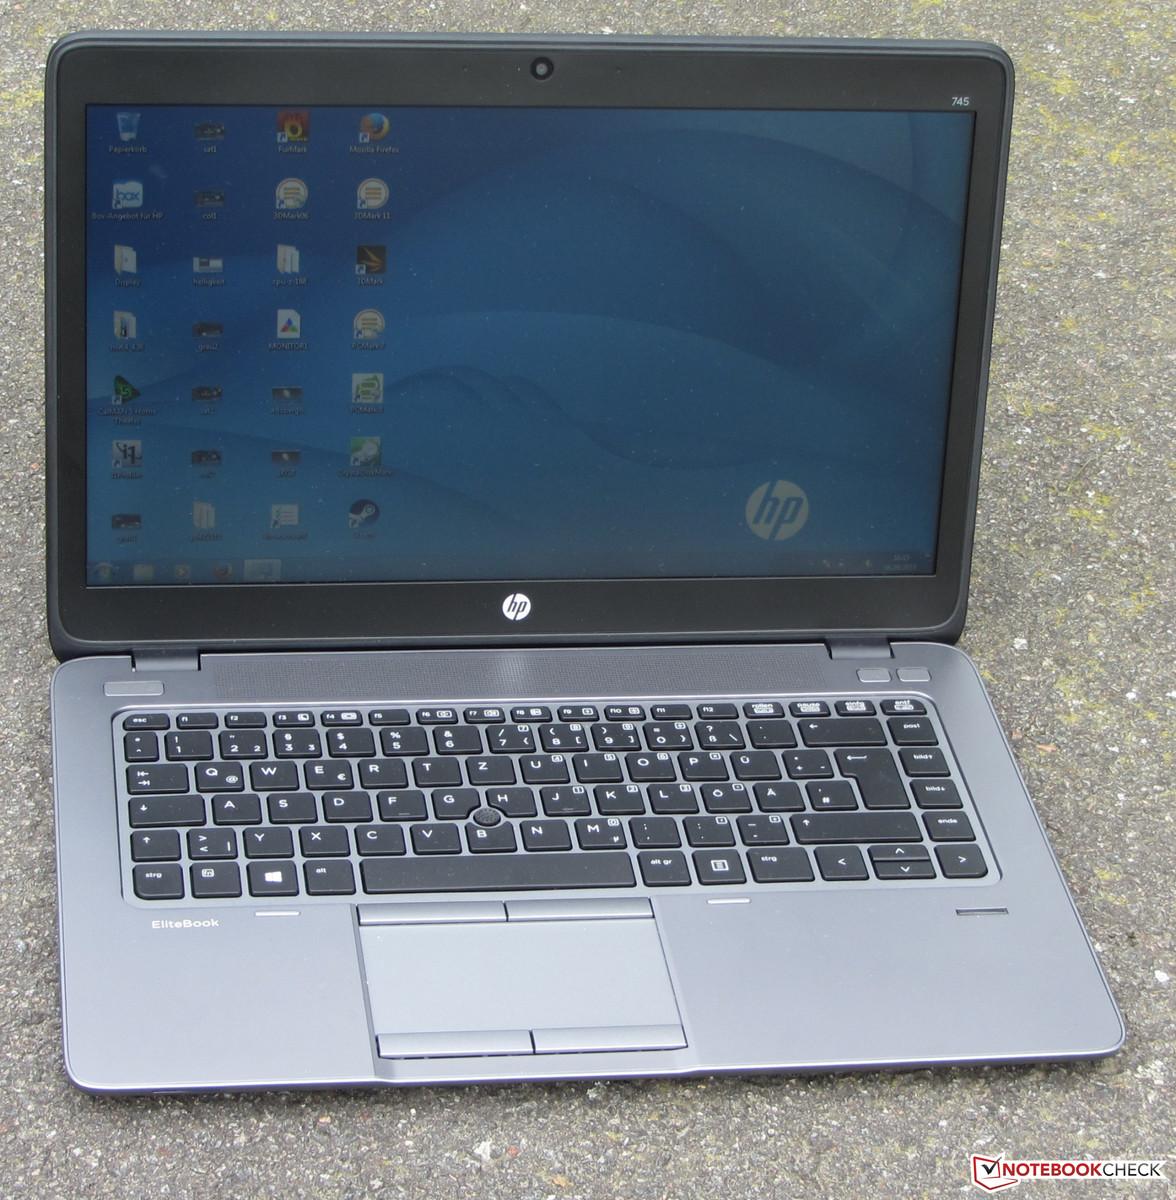 Test HP Elitebook 745 G2 Notebook - Notebookcheck.com Tests